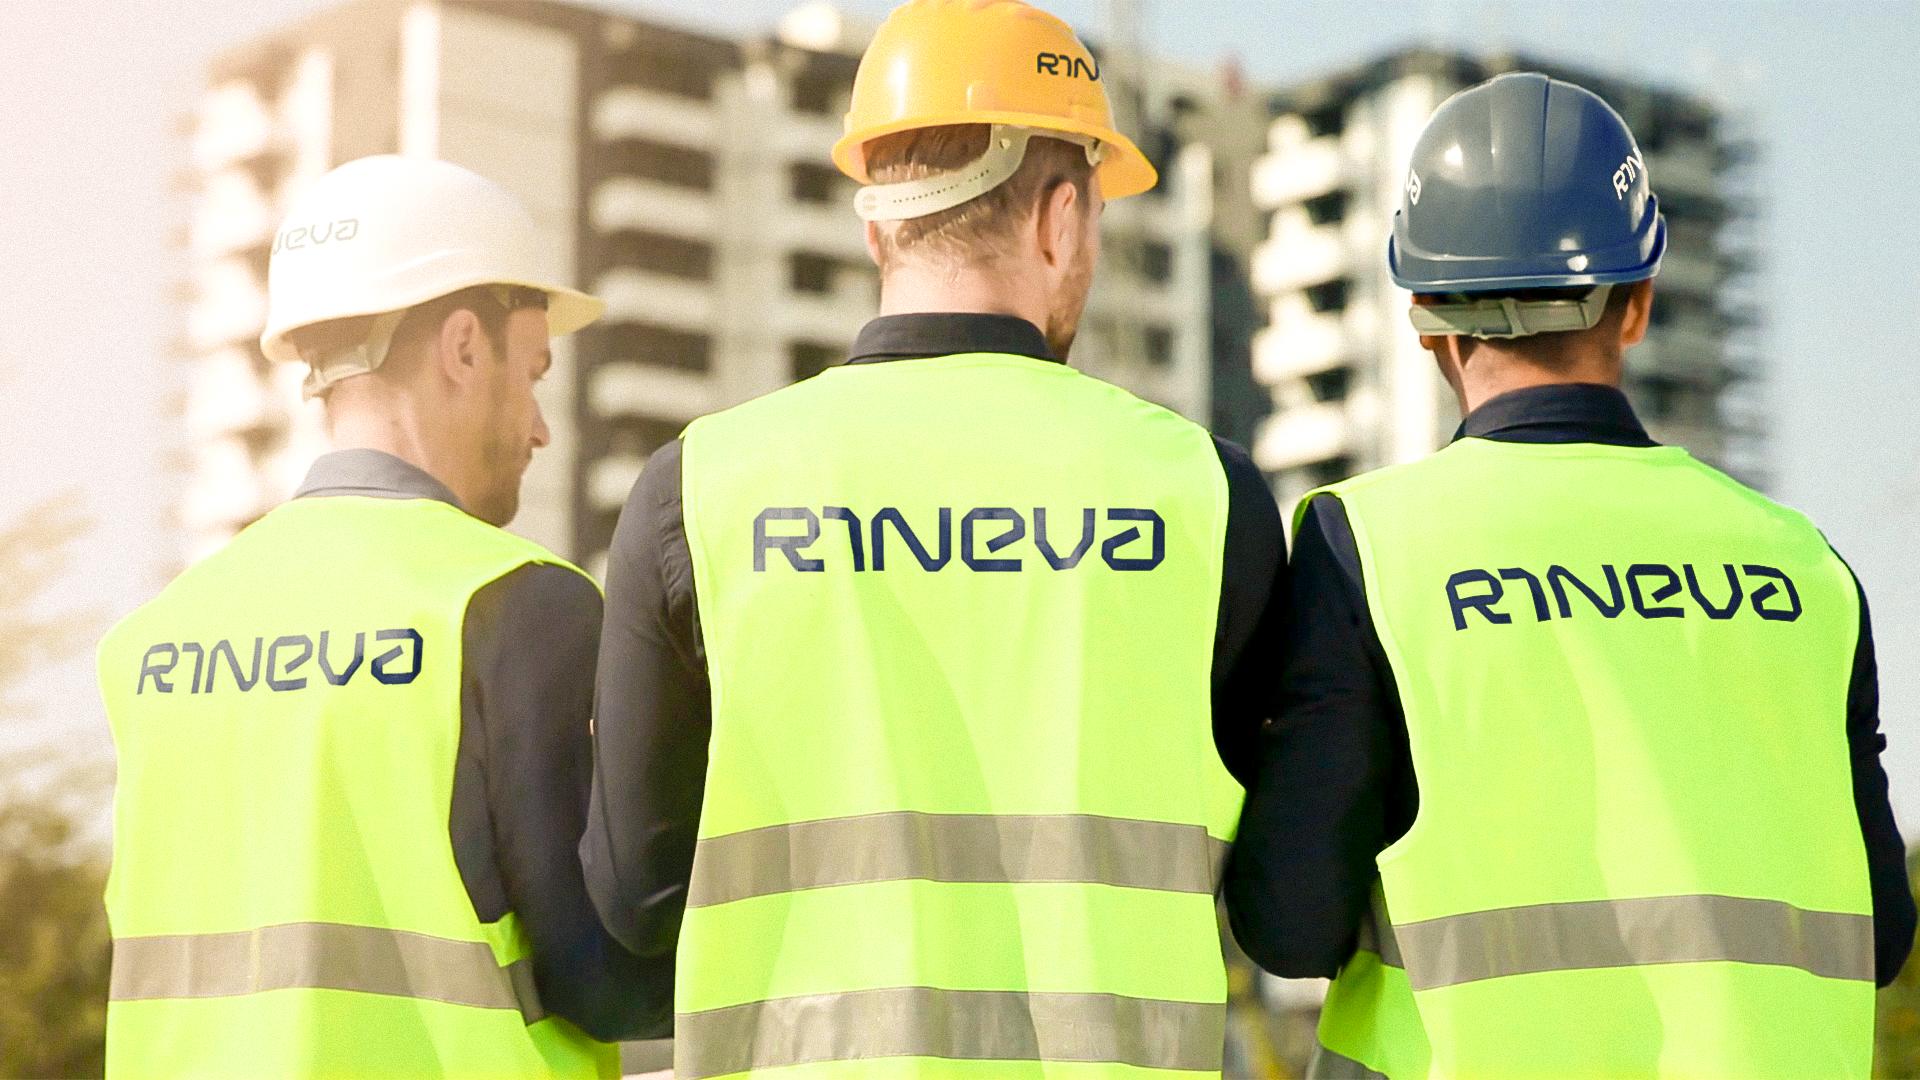 rineva_engenheiros02.png